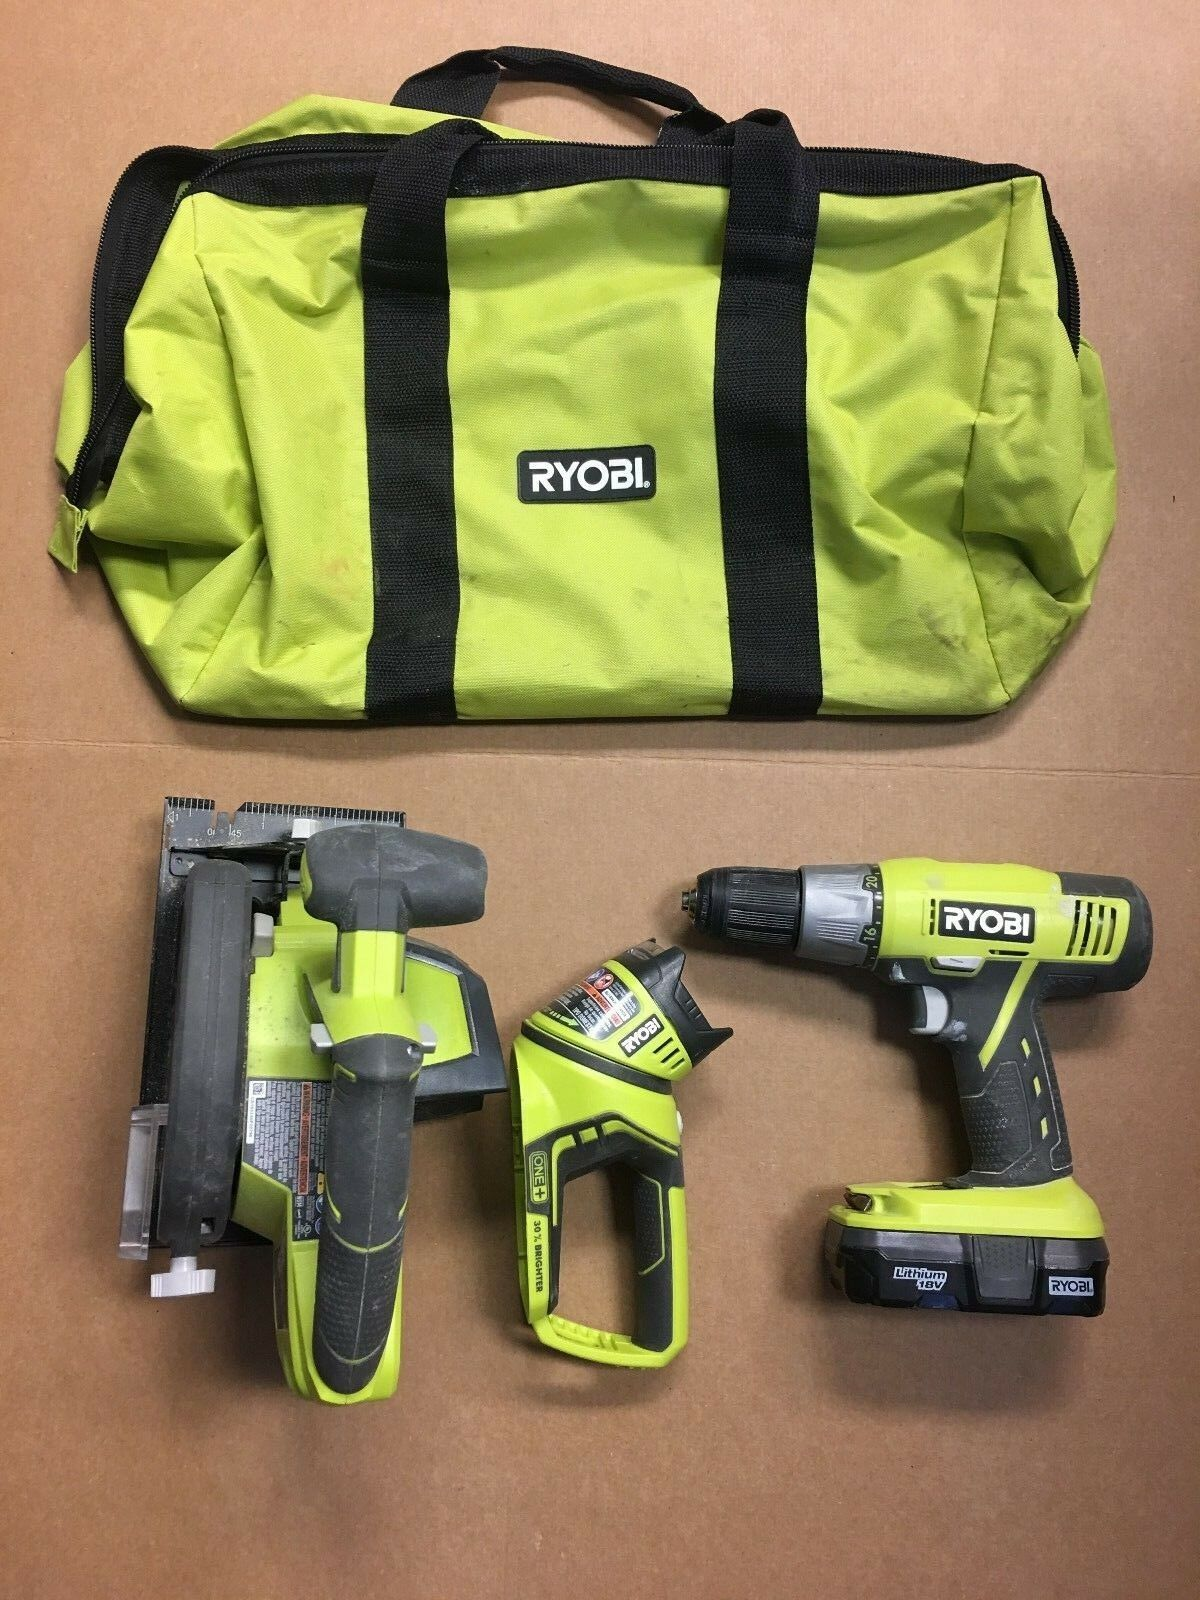 Ryobi  P506 18v Cordless Circular Saw p271 cordless drill driver & P704 light